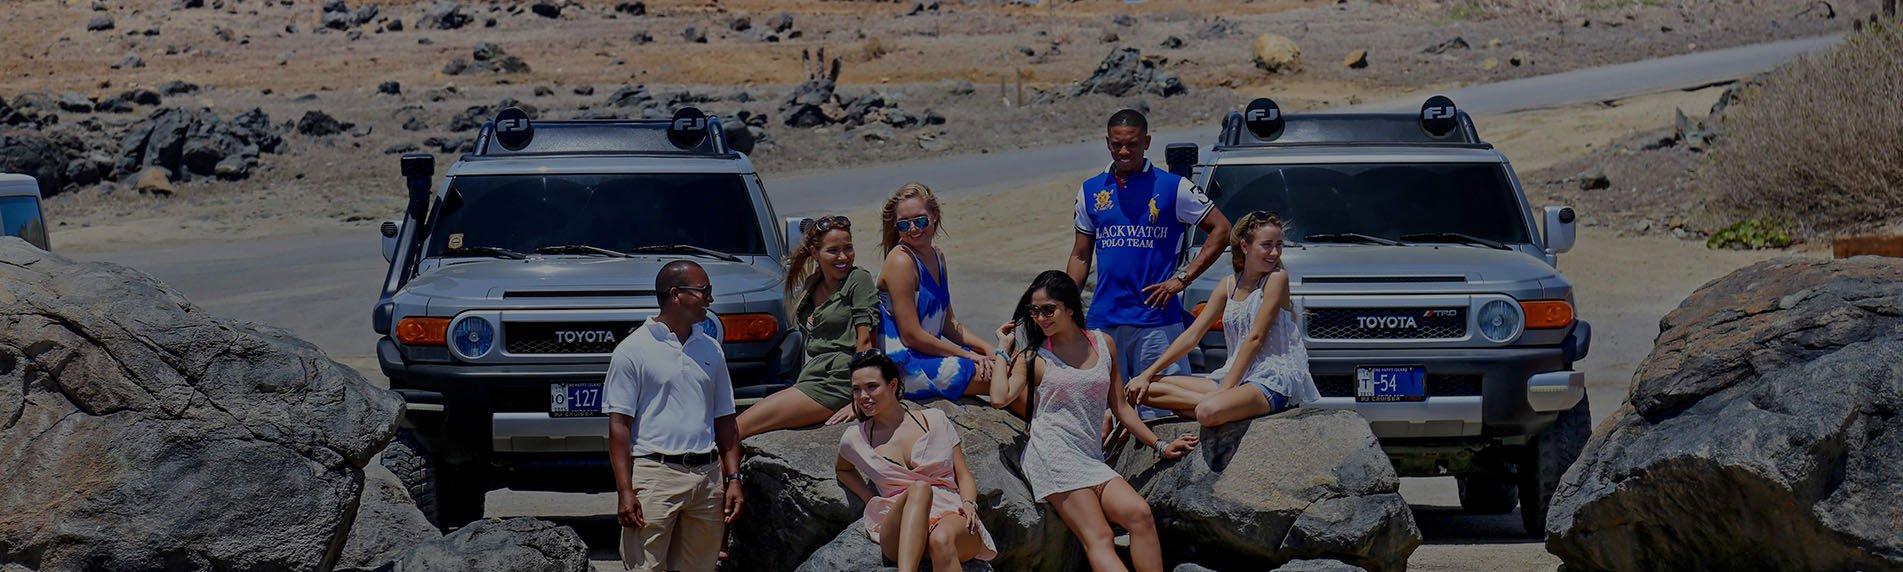 Aruba Private Jeep Tour - Eight Hour